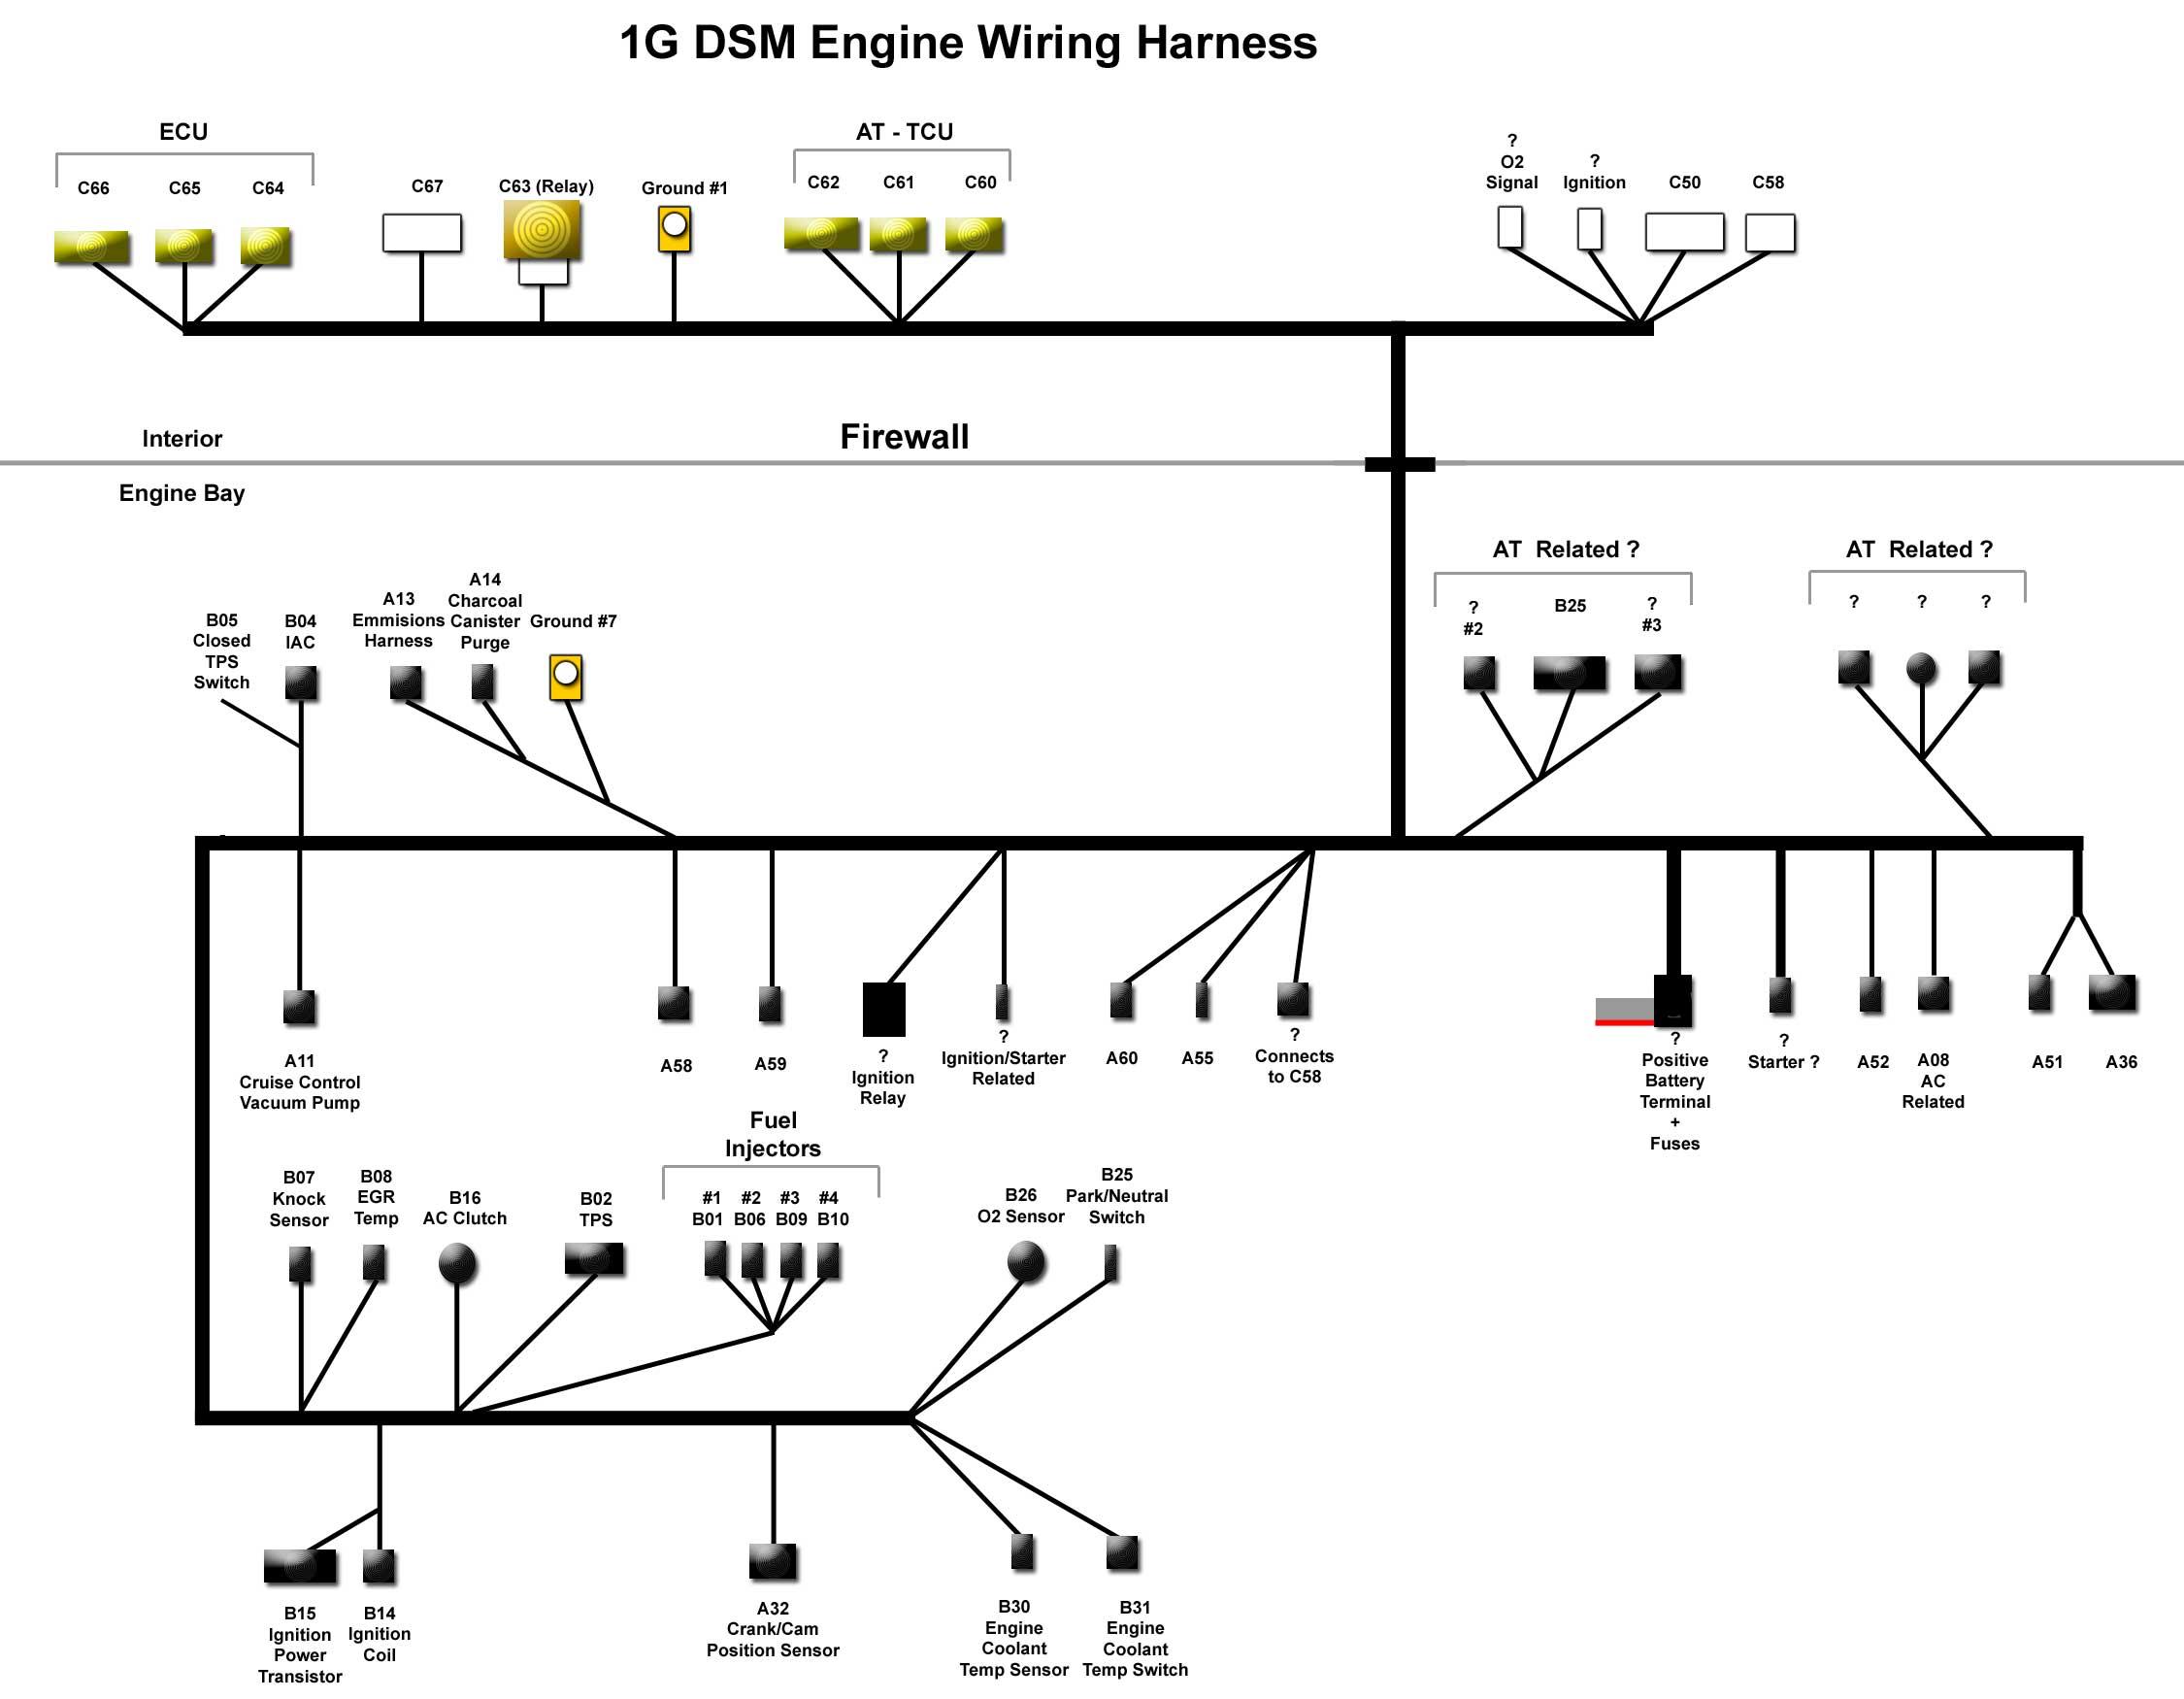 1Gb DSM 4G63 Turbo Wiring Harness Diagram